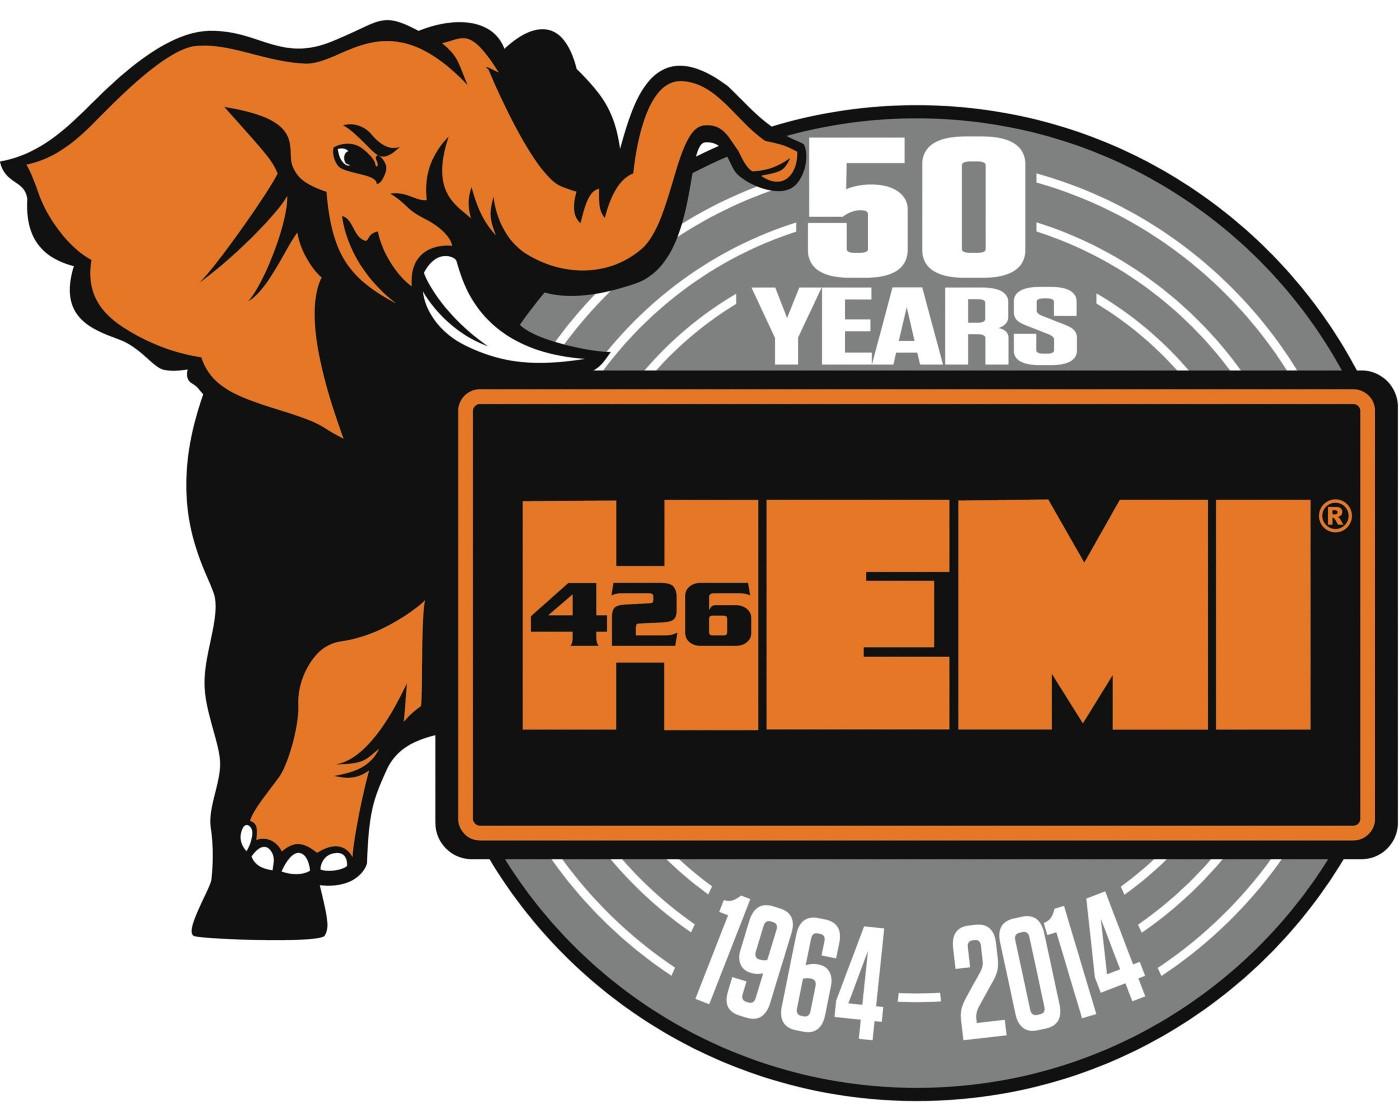 Dodge Challenger A Vendre >> Mopar Celebrates 50th Anniversary Of The HEMI V-8 This Year